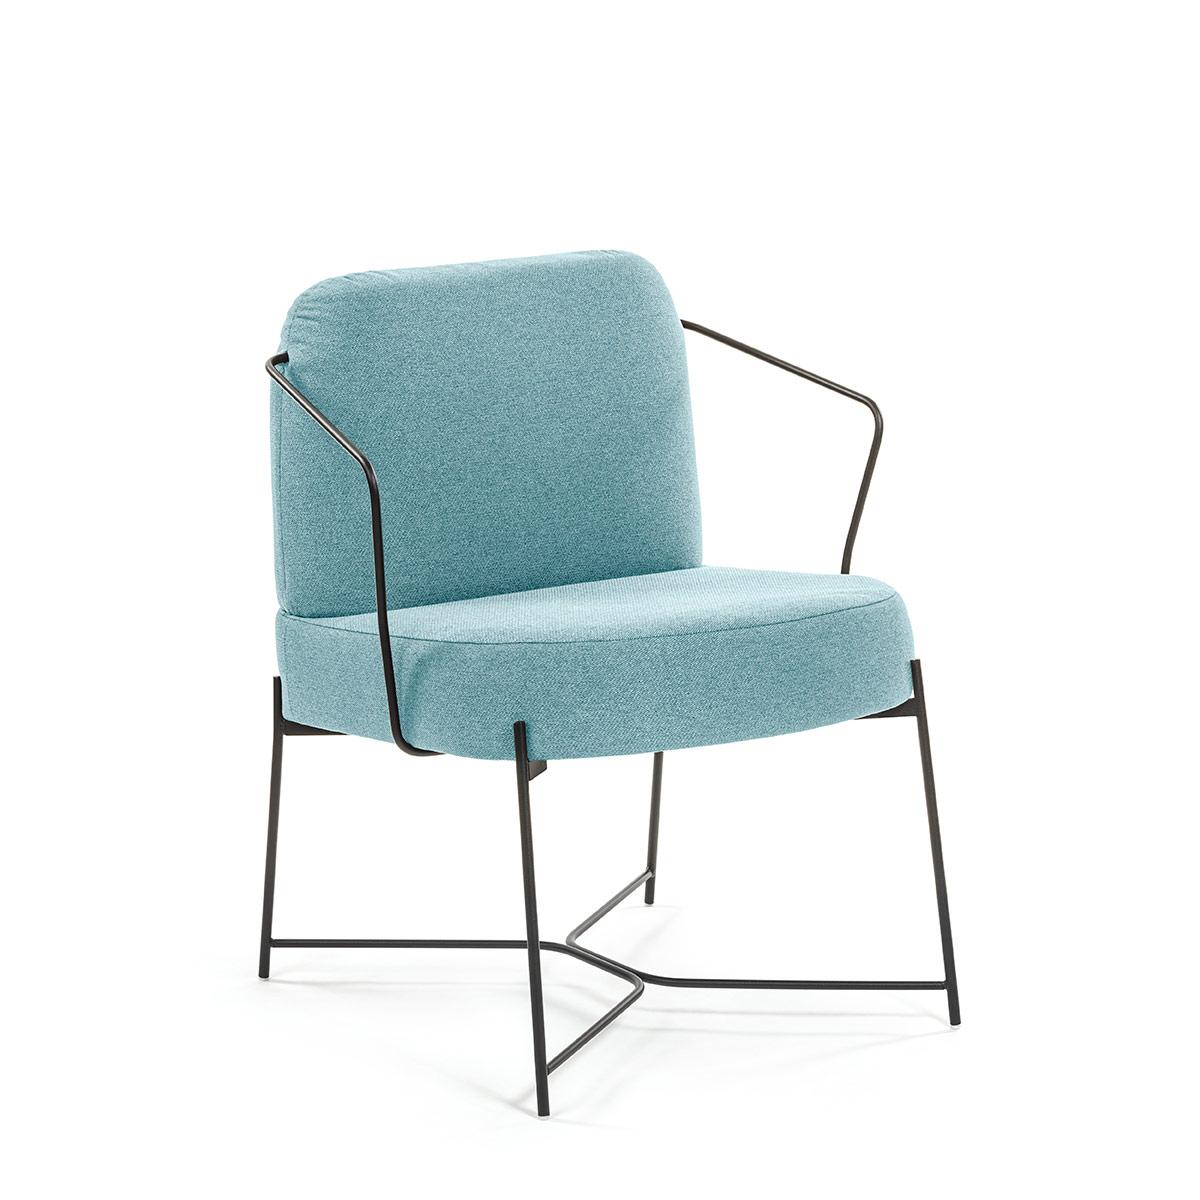 Tuli Nimble Chair W - Petrolejová